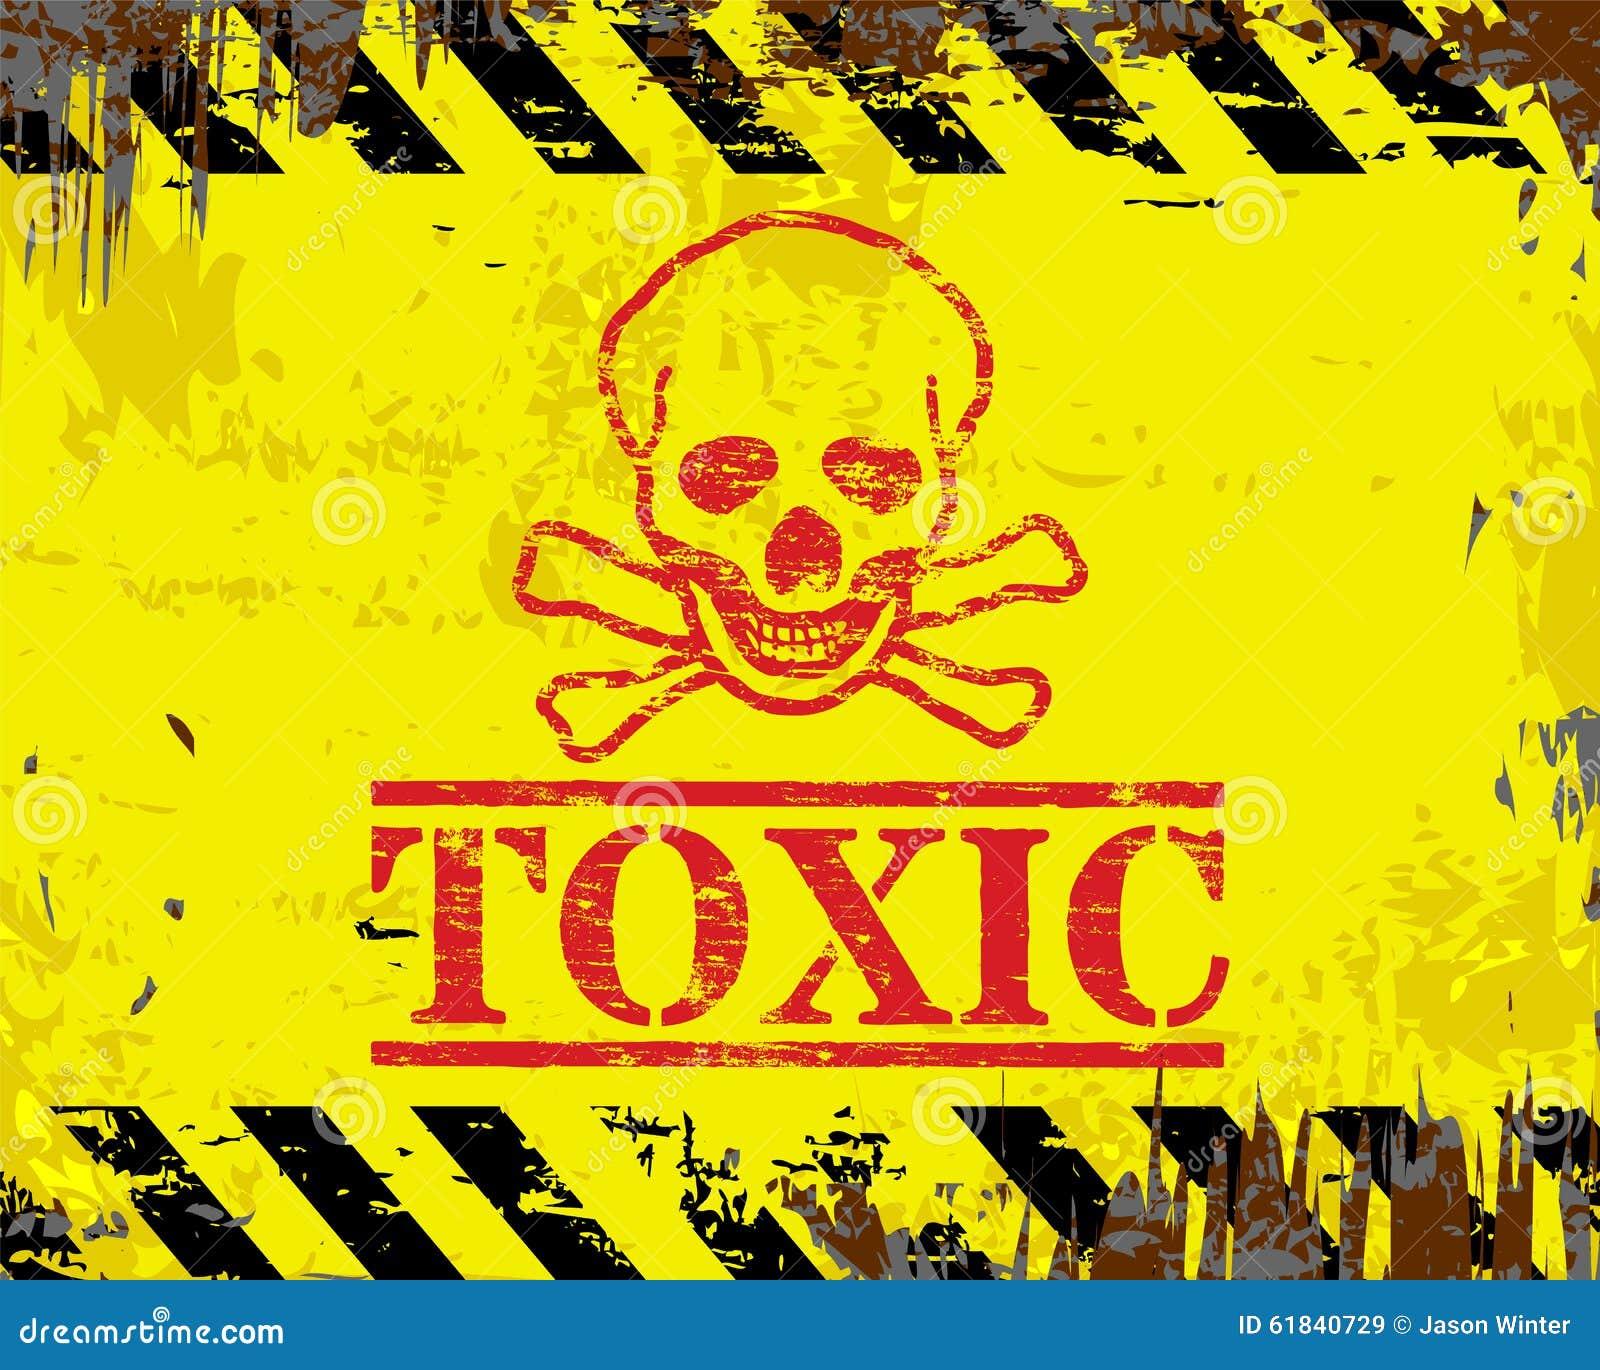 toxic sign and skulls - photo #4